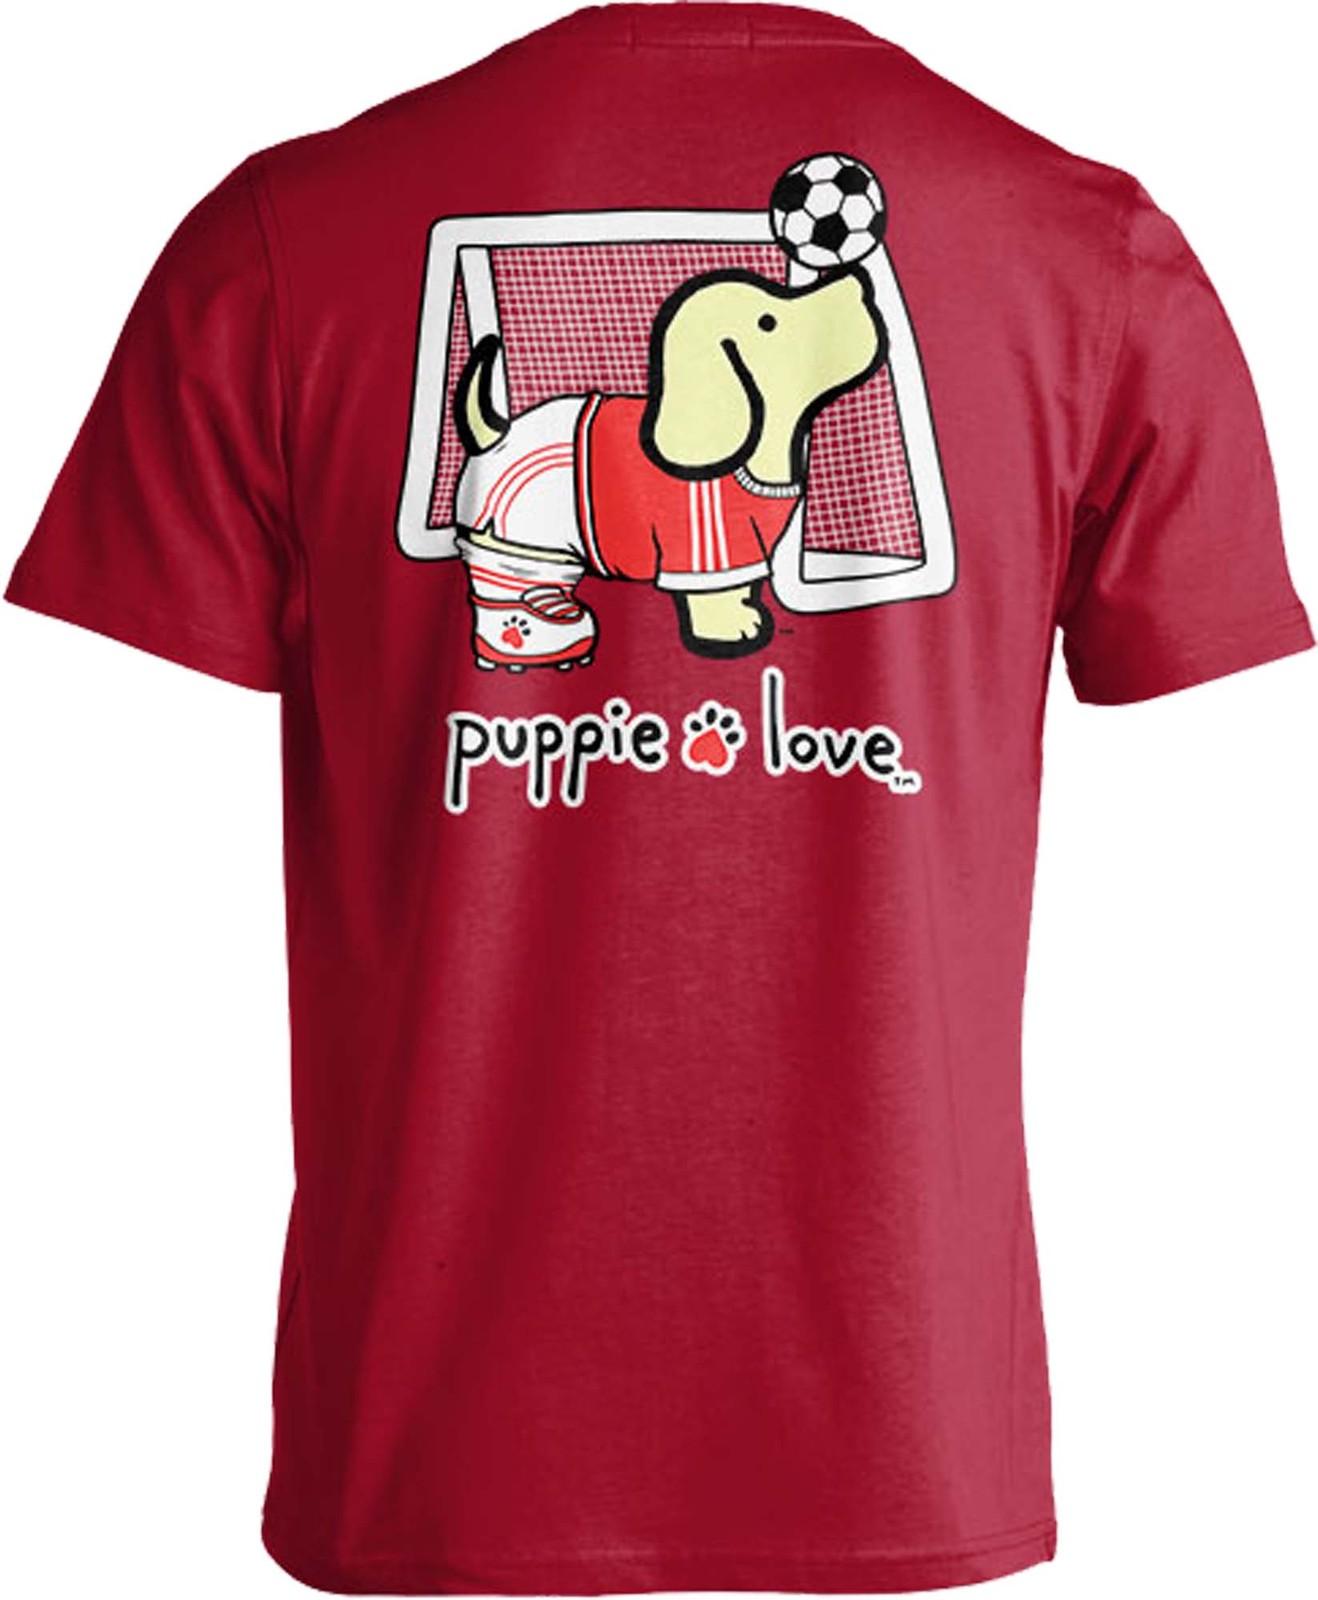 Soccer pup car 565 ss 1